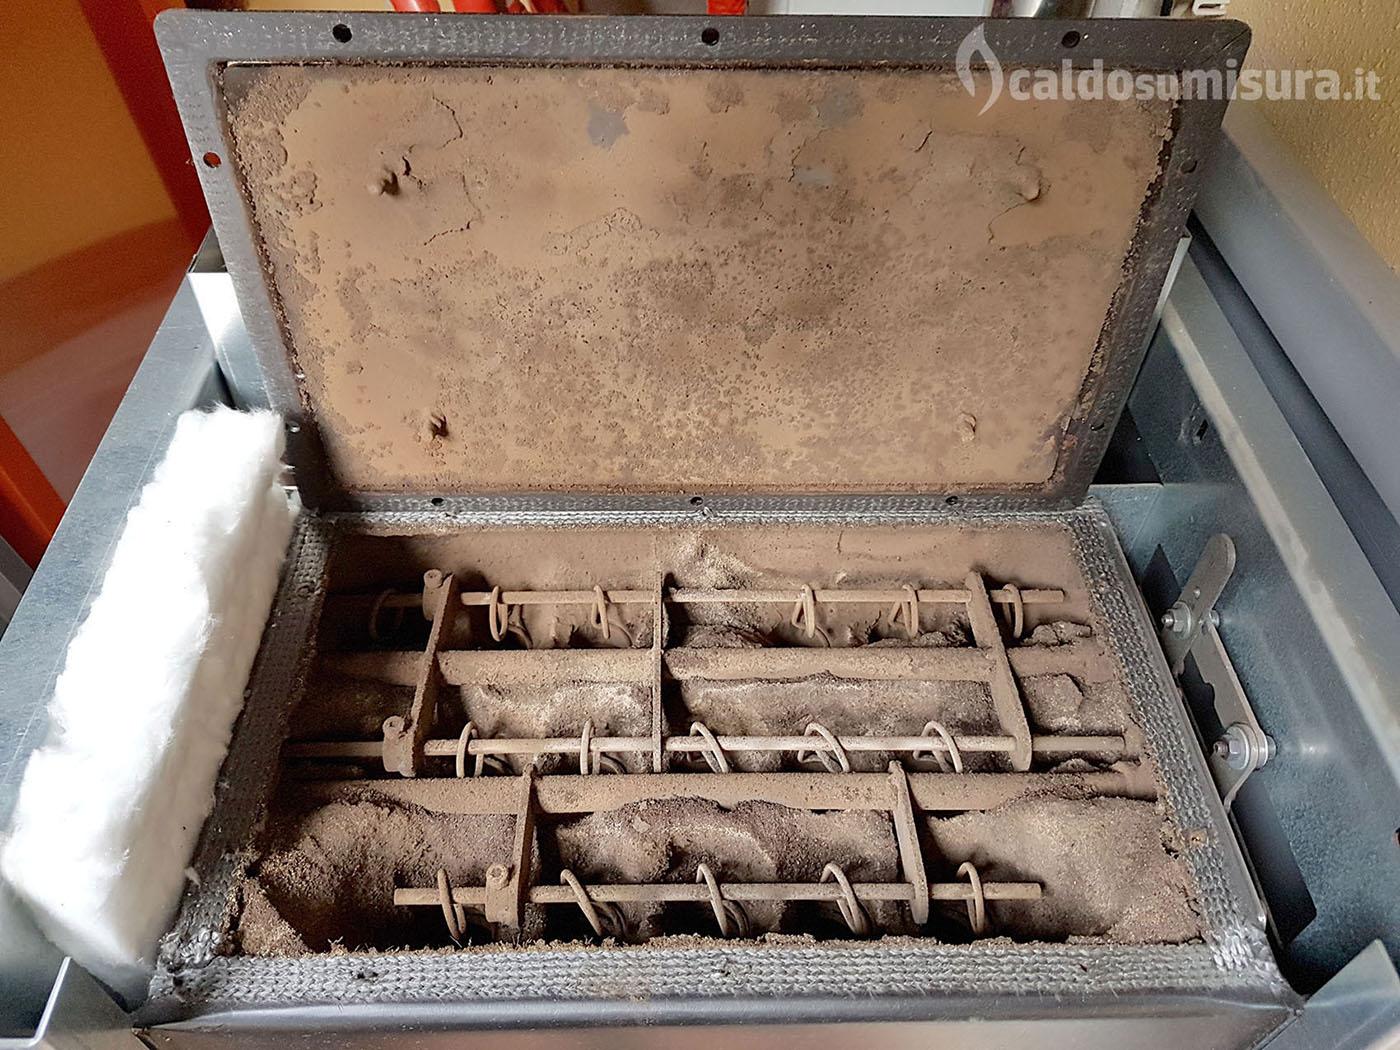 Manutenzione stufa a pellet caldo su misura - Pulire stufa a pellet ...